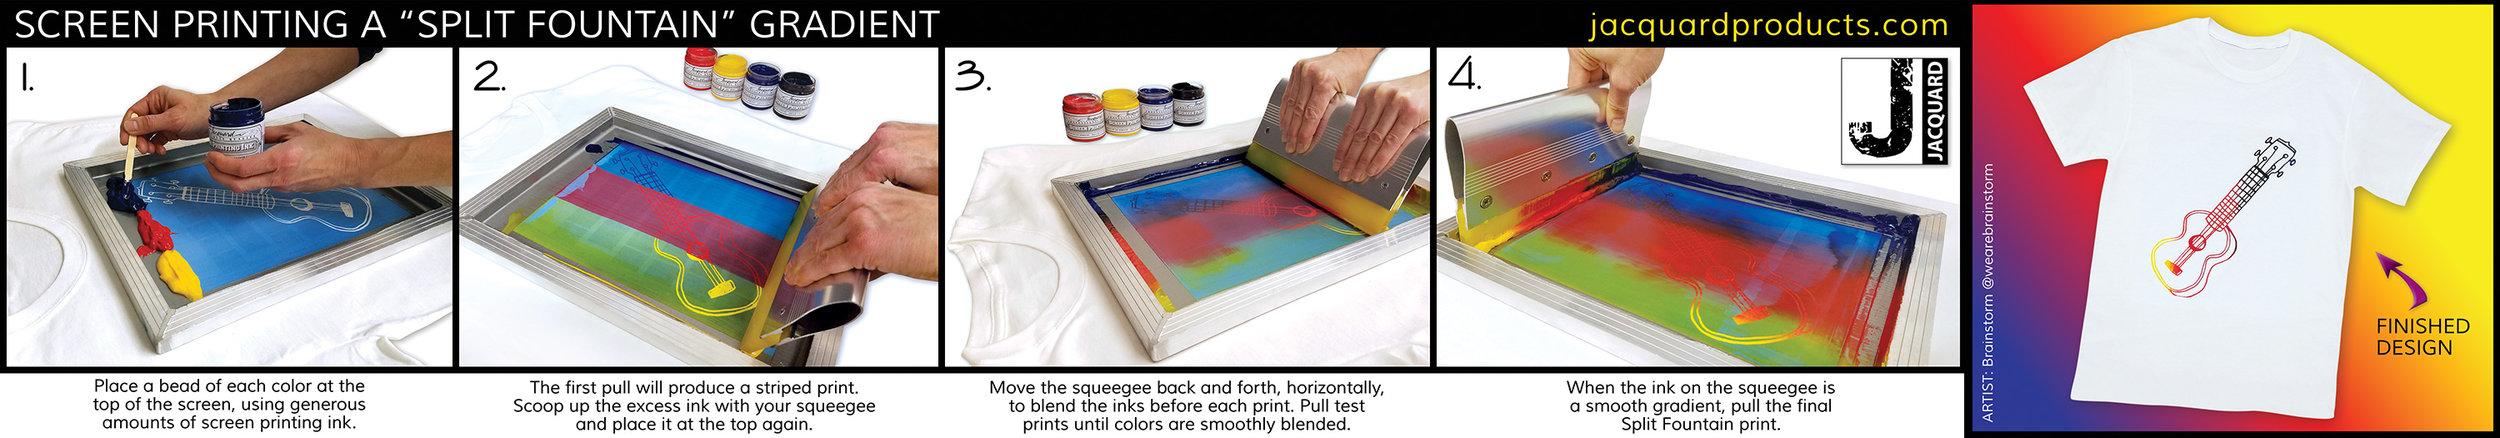 JSI9000-tricolor-fountain-sequence-horiz_RGB-150dpi.jpg